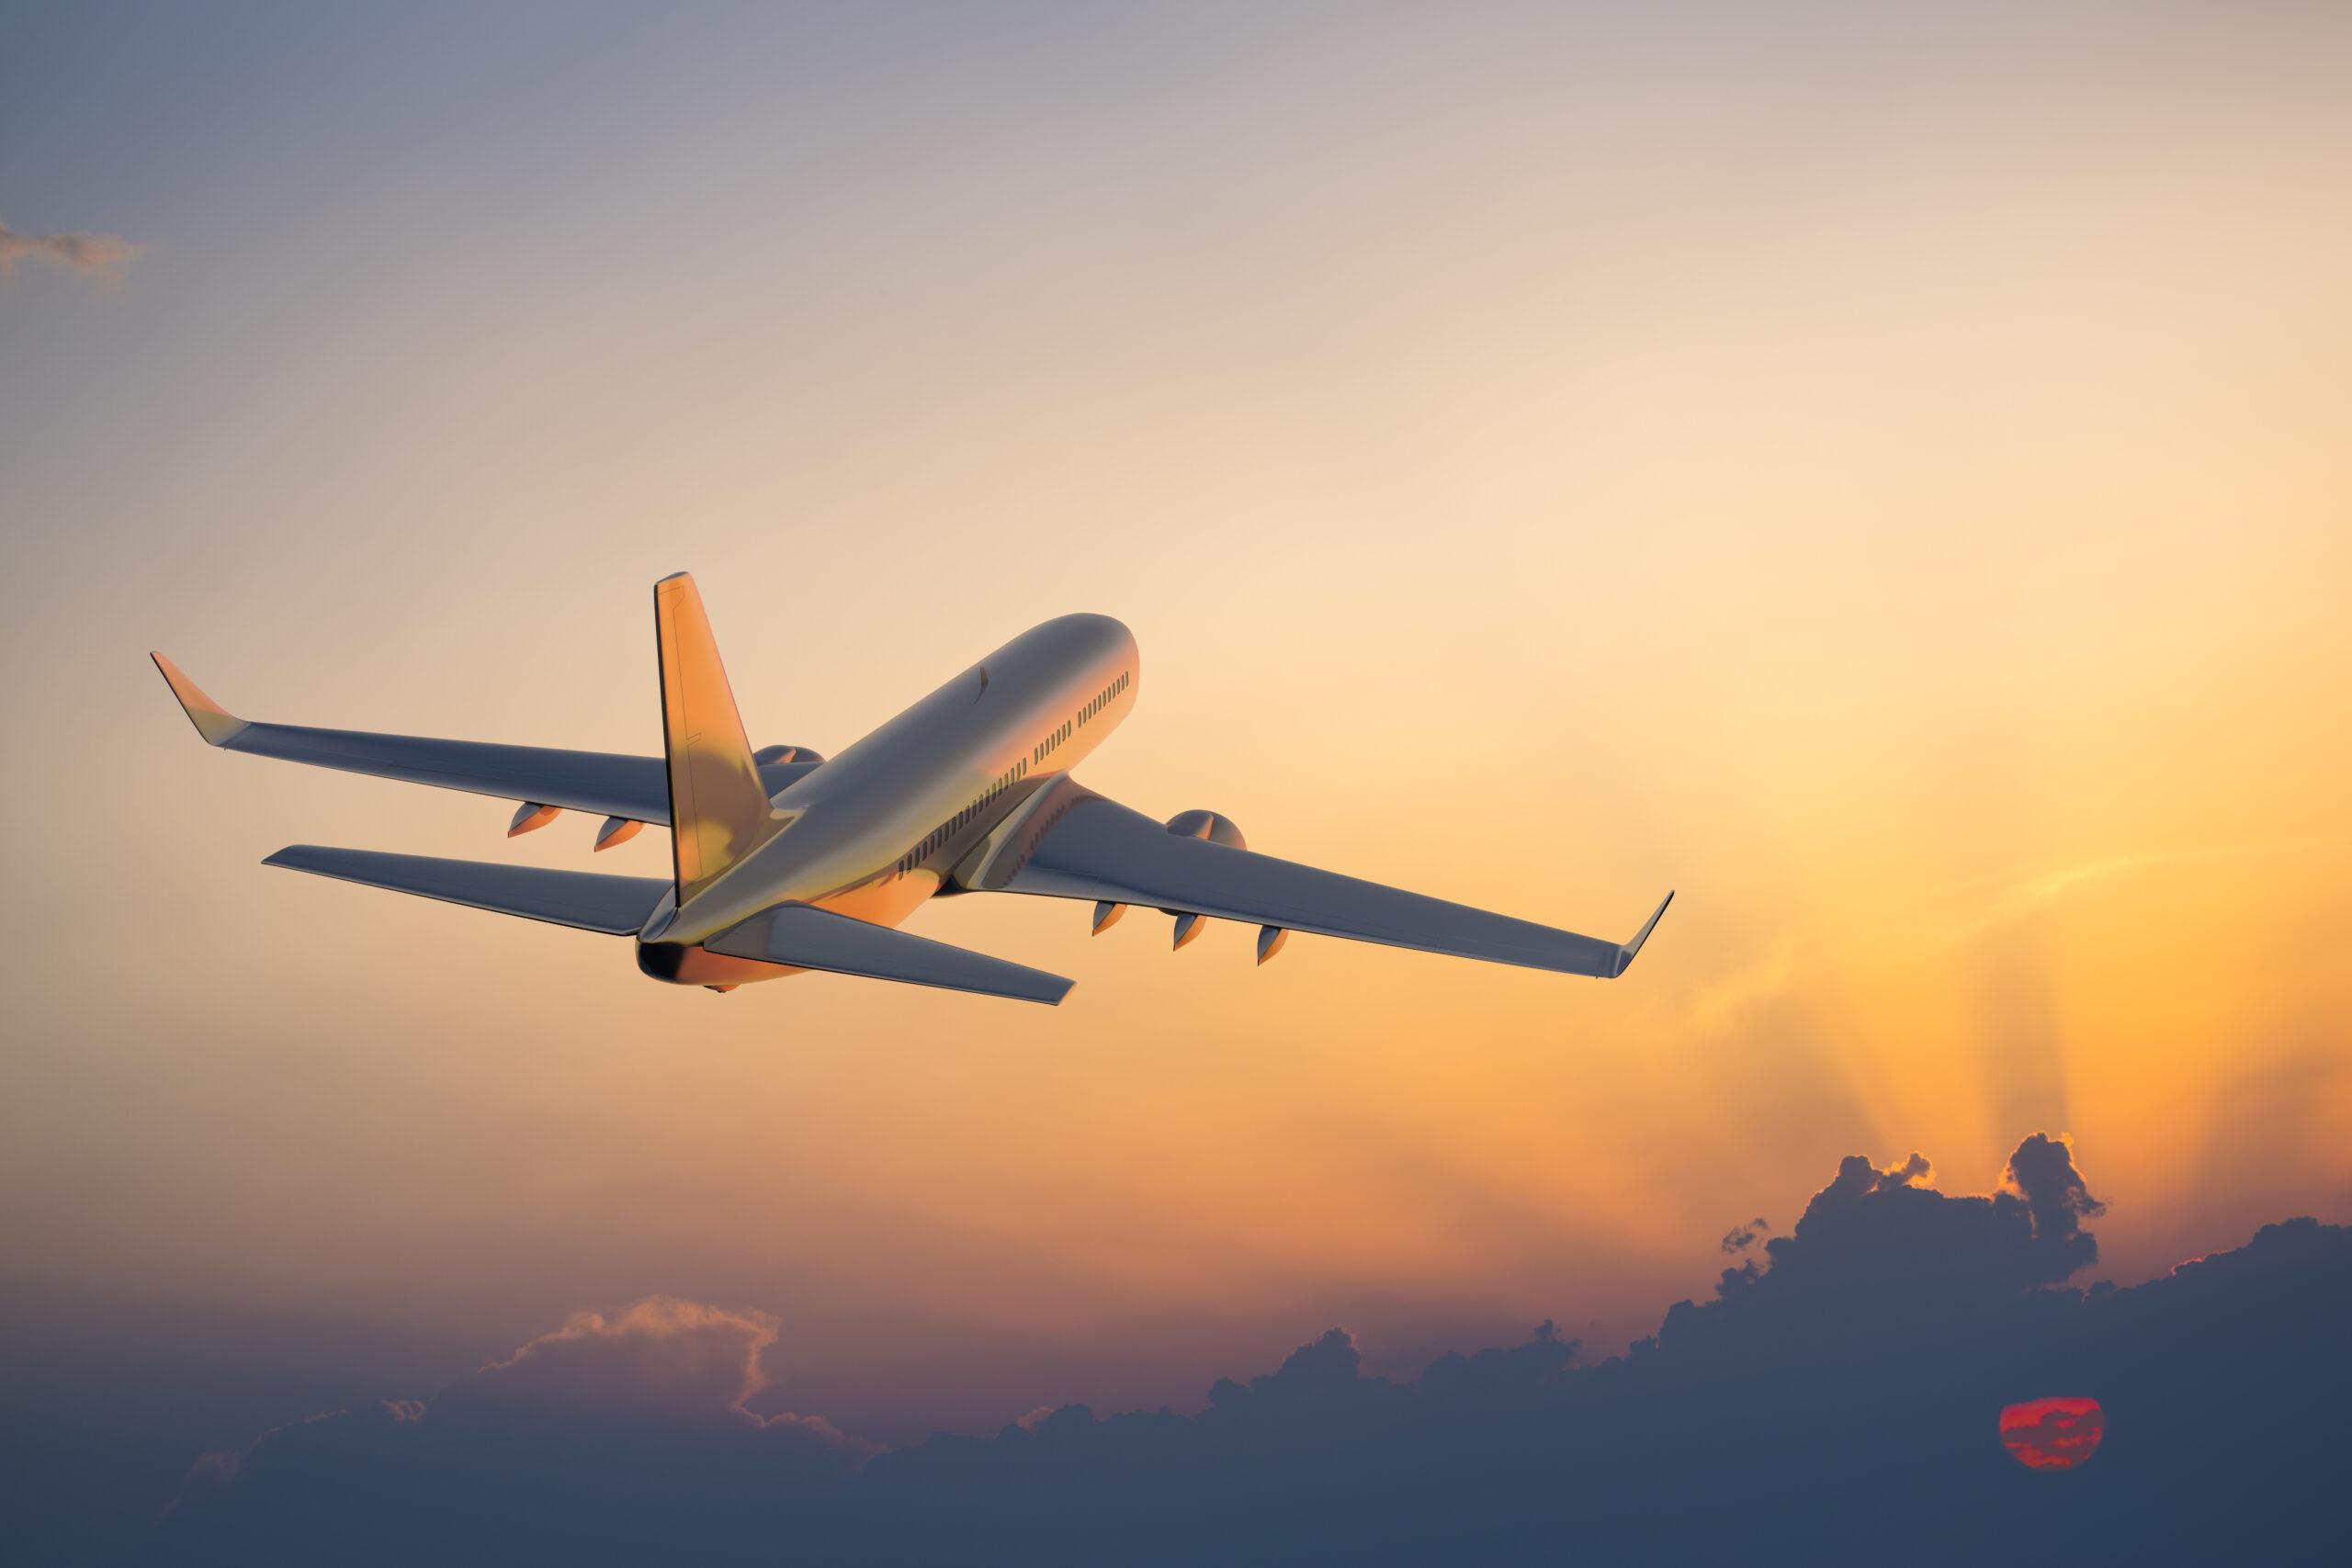 Company Travel Policies & Johnny Cash